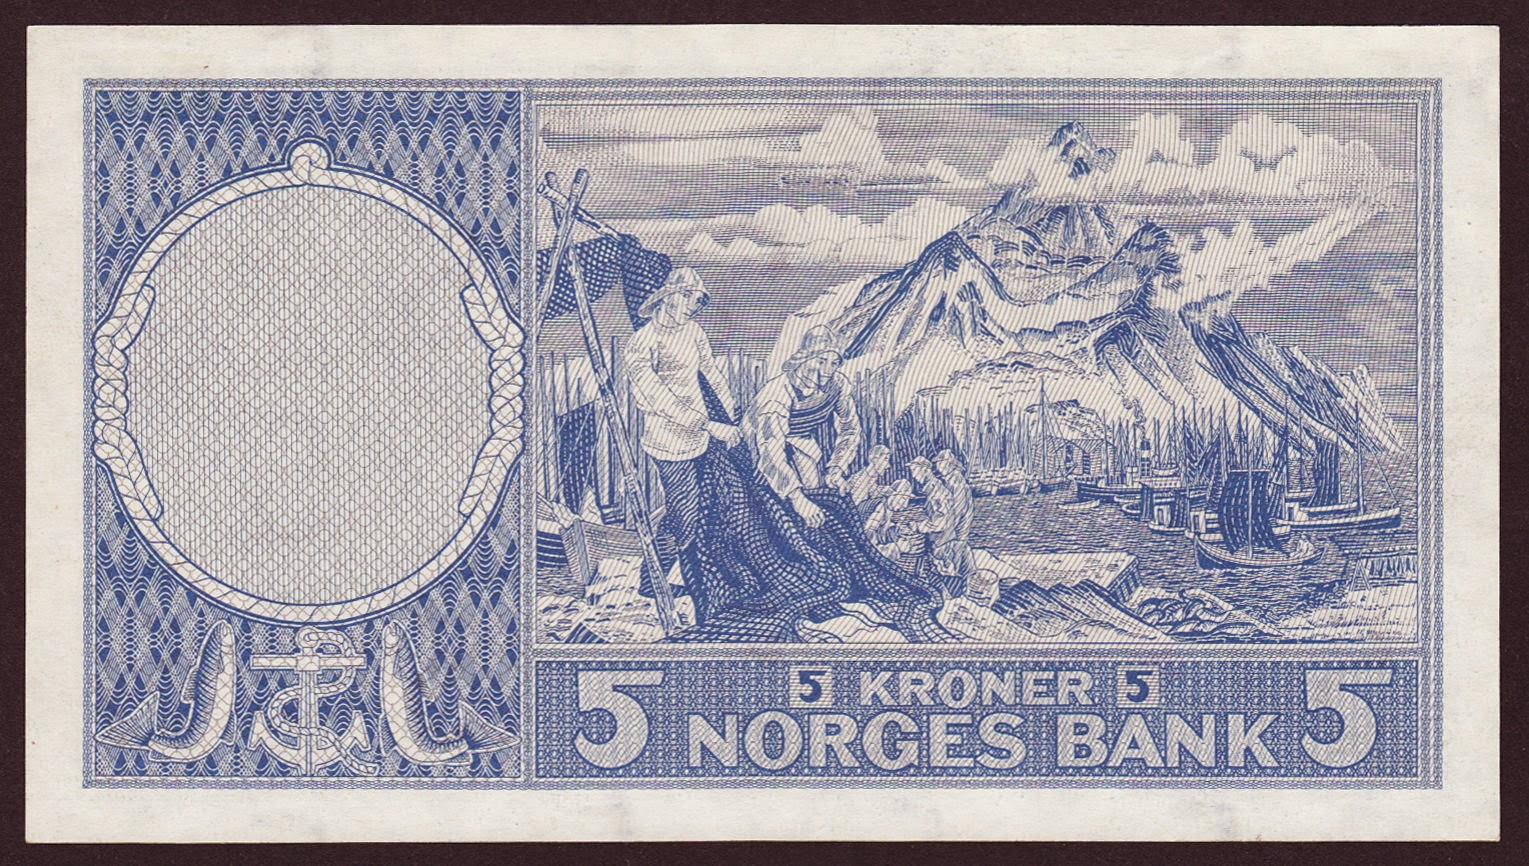 Norway Banknotes 5 Kroner note 1960 Fisheries scene from the Lofoten